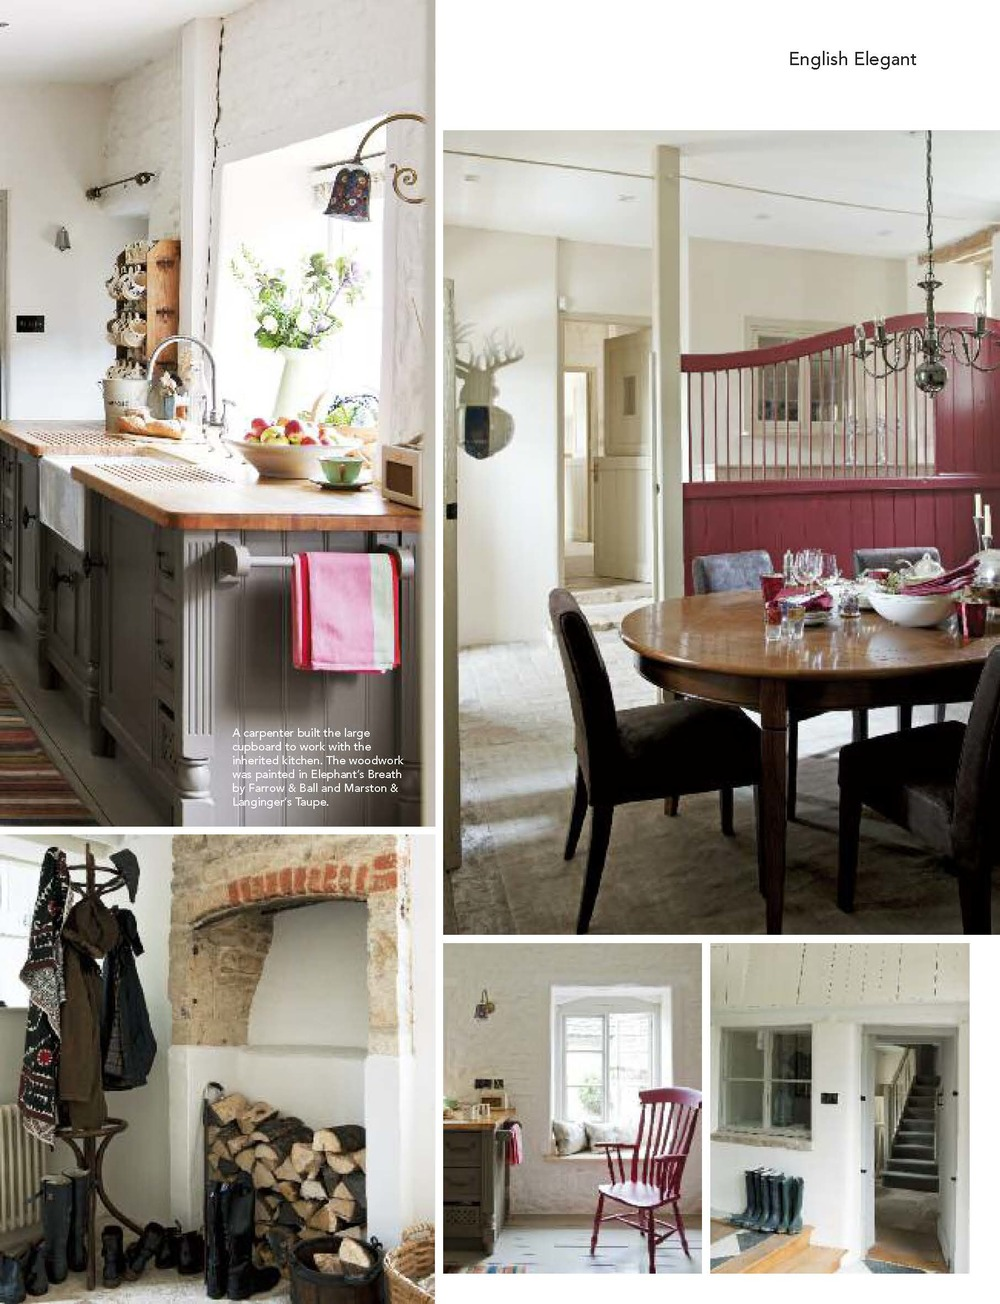 The English Home_Page_5.jpg